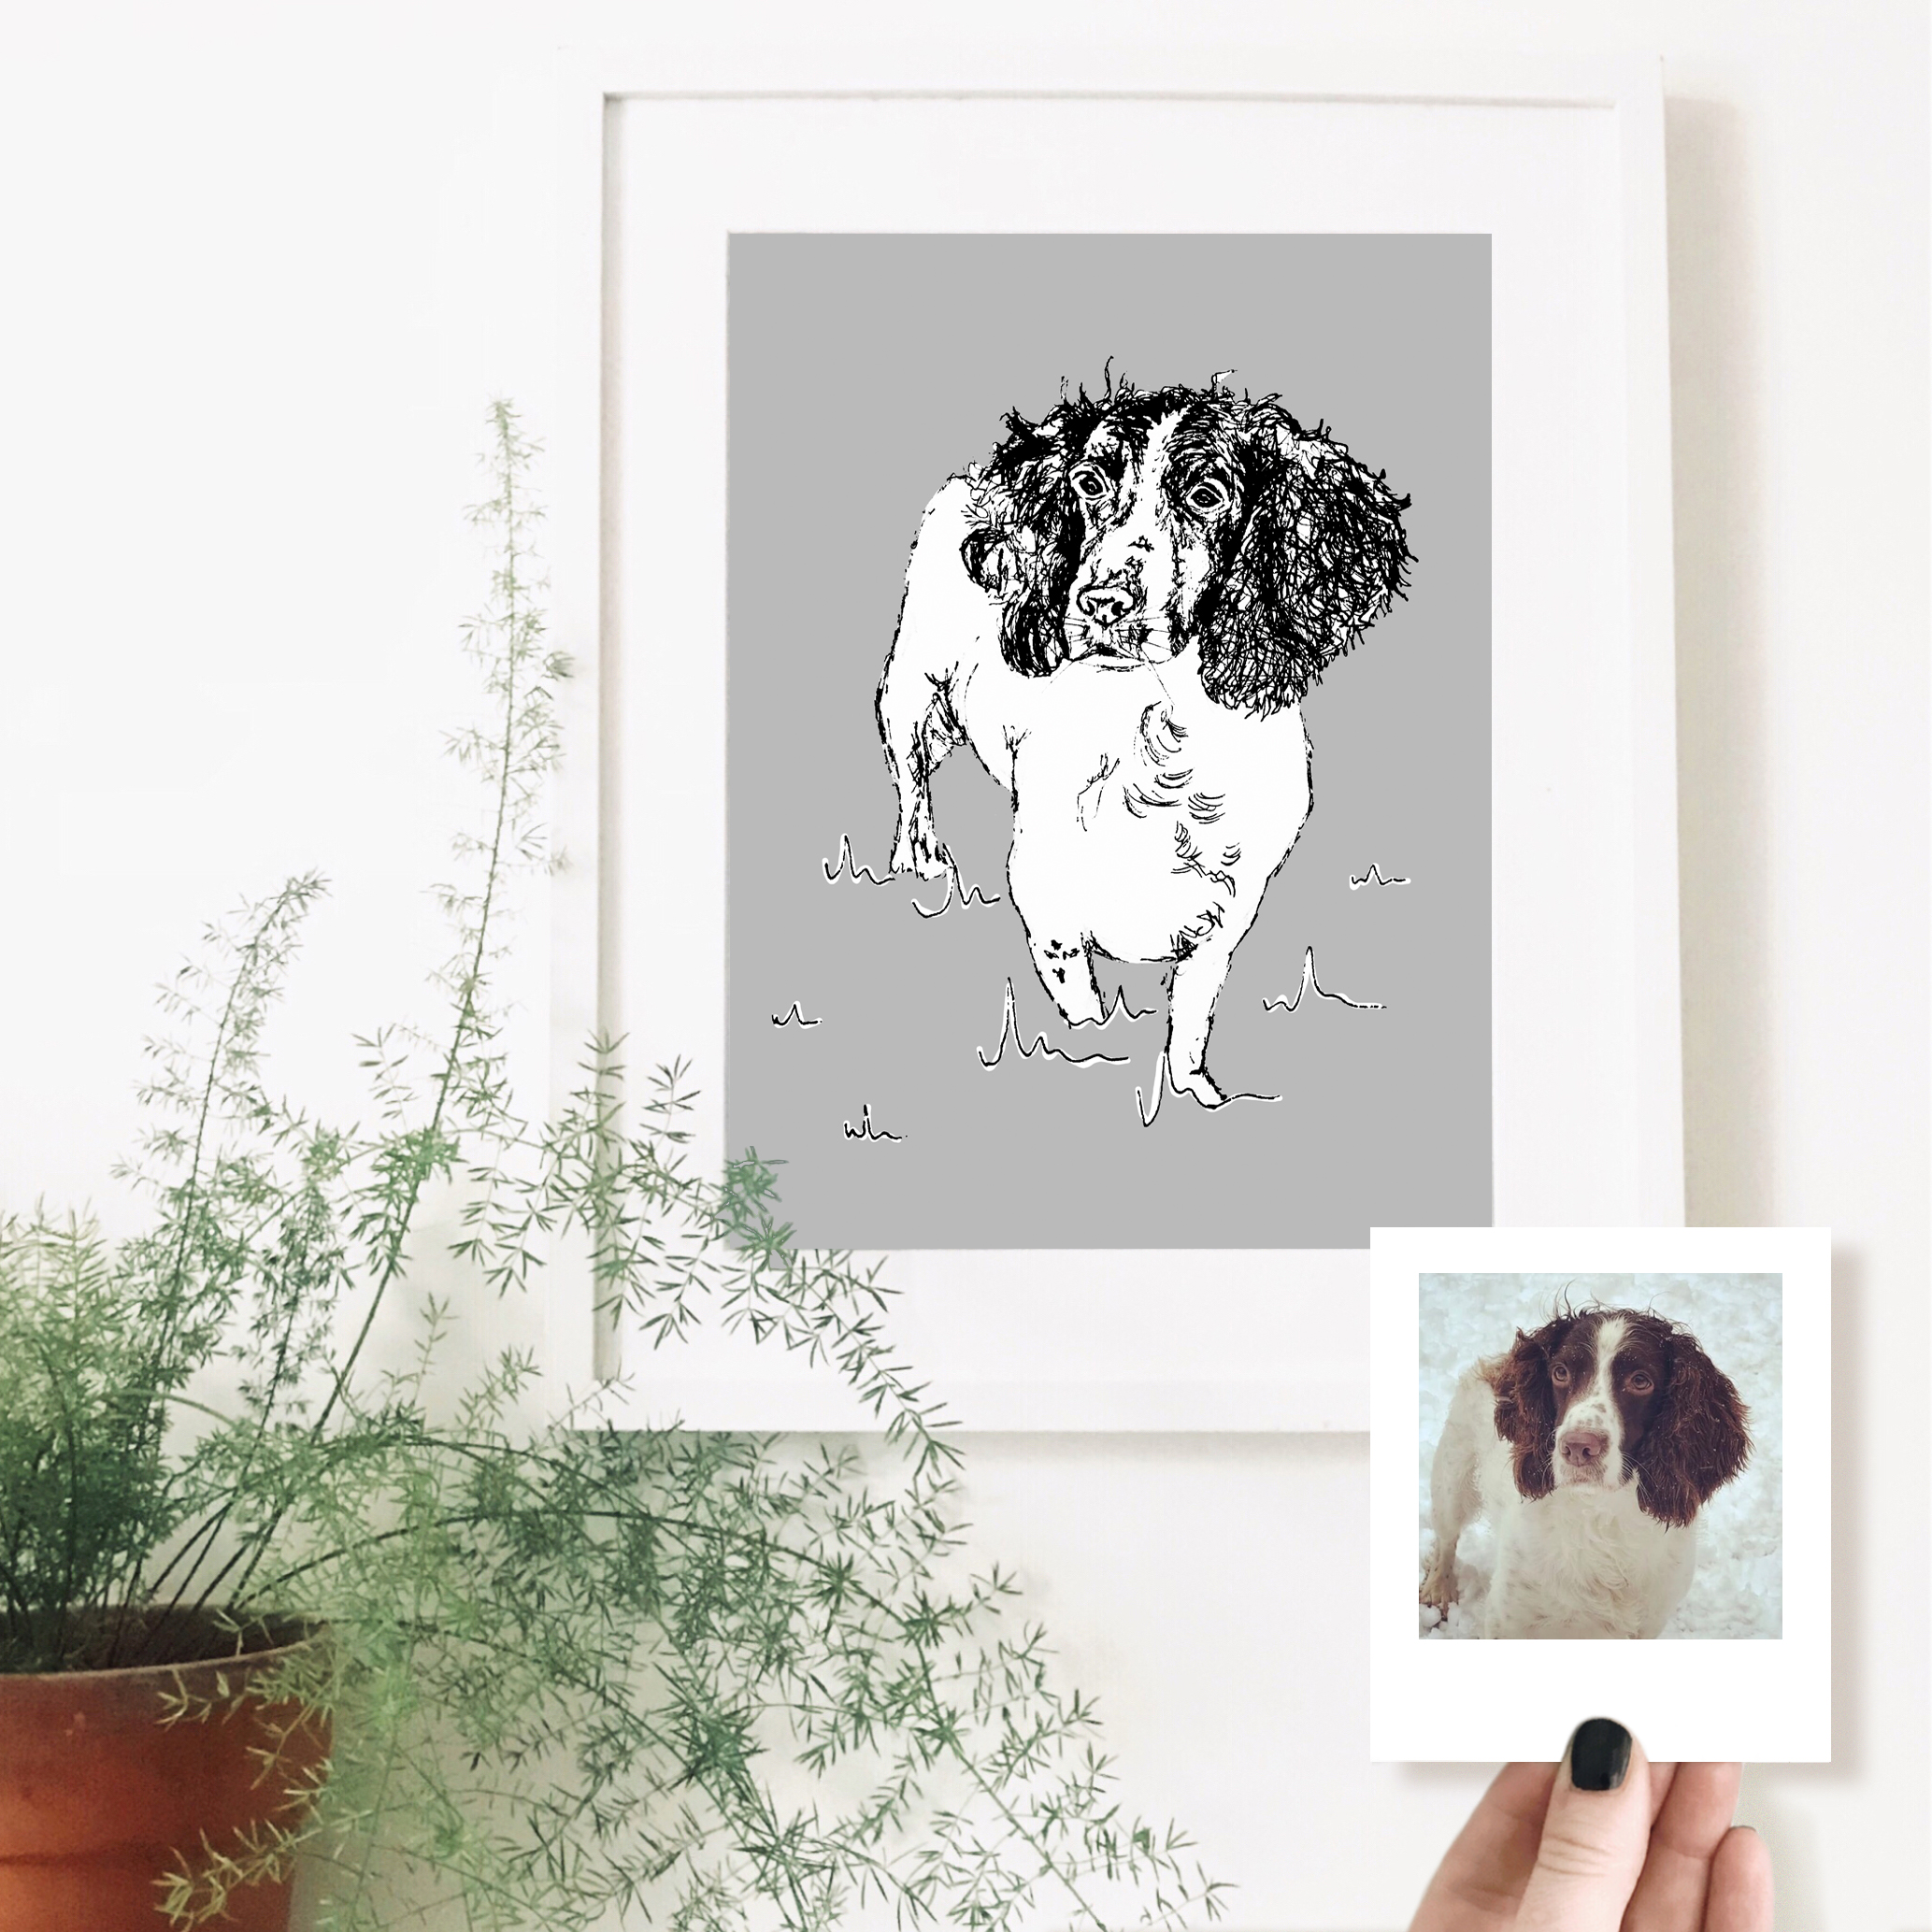 spaniel-dog-pet-portrait-drawing.jpg